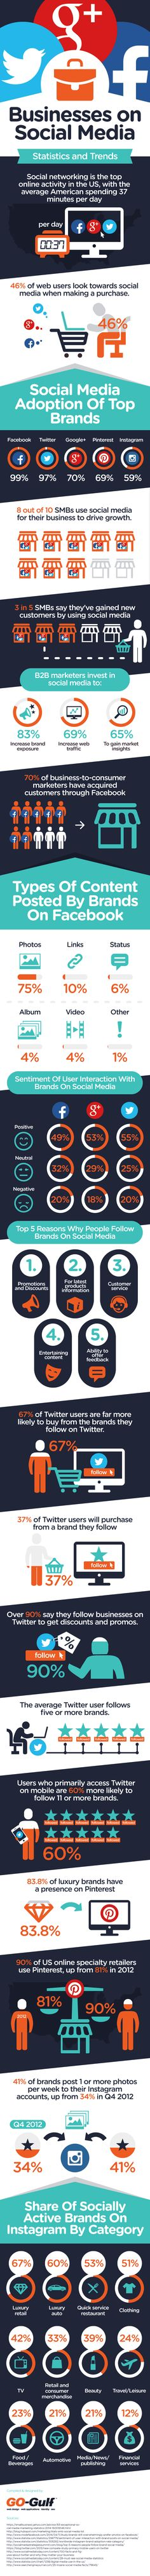 Infográfico: por que os consumidores seguem as marcas nas redes sociais, #infographic